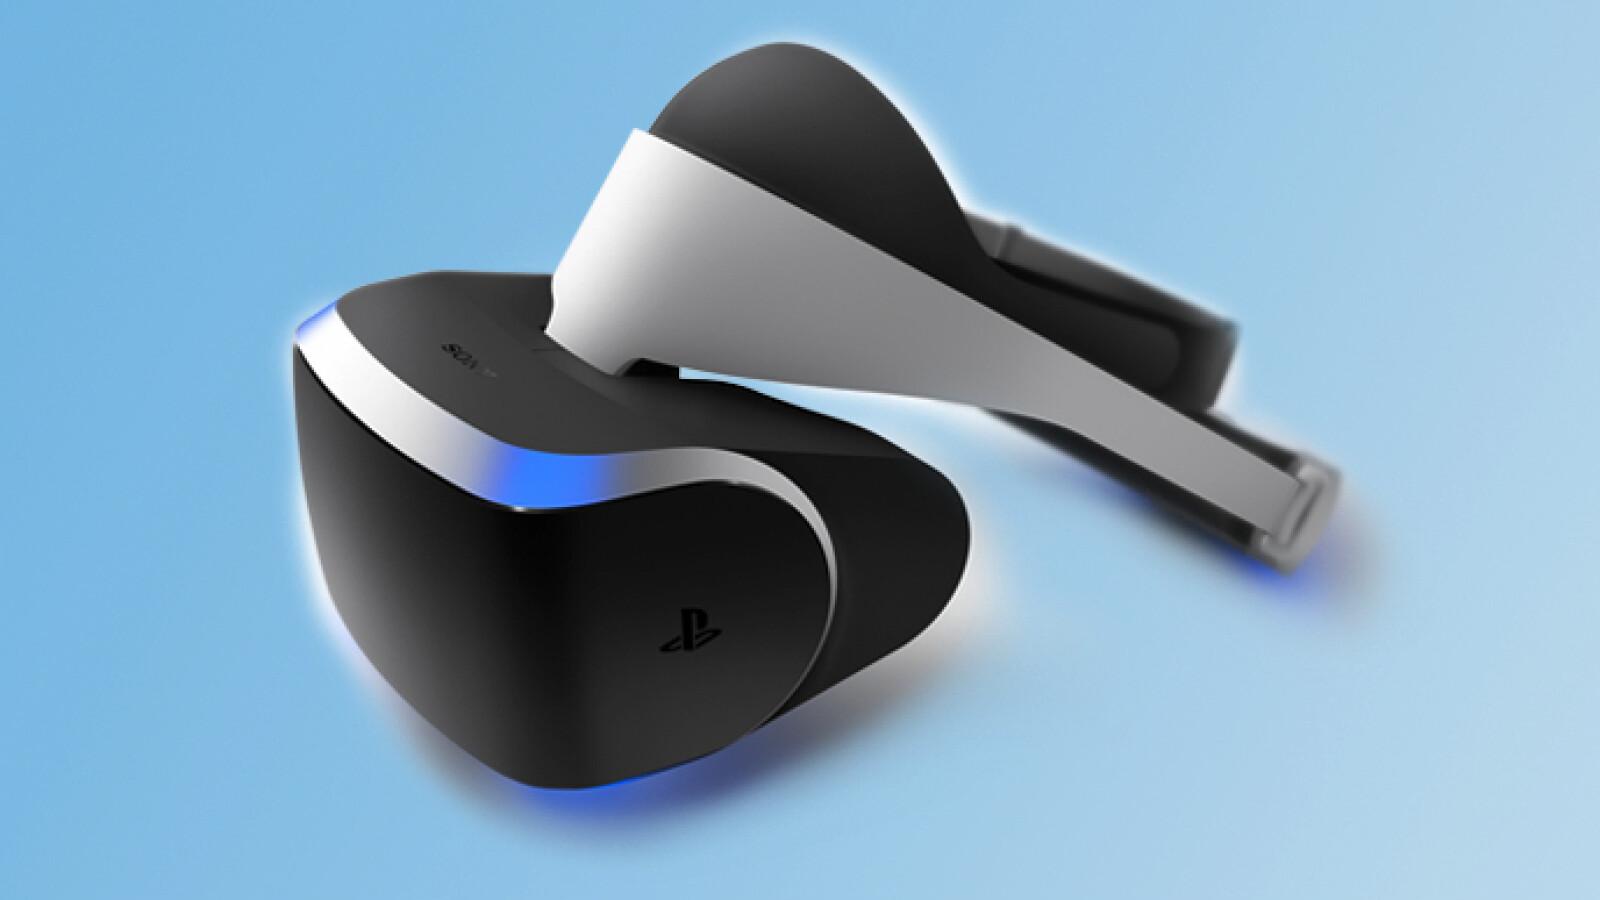 Sony Vr Brille 2 : Playstation vr das vr gaming system für ps playstation